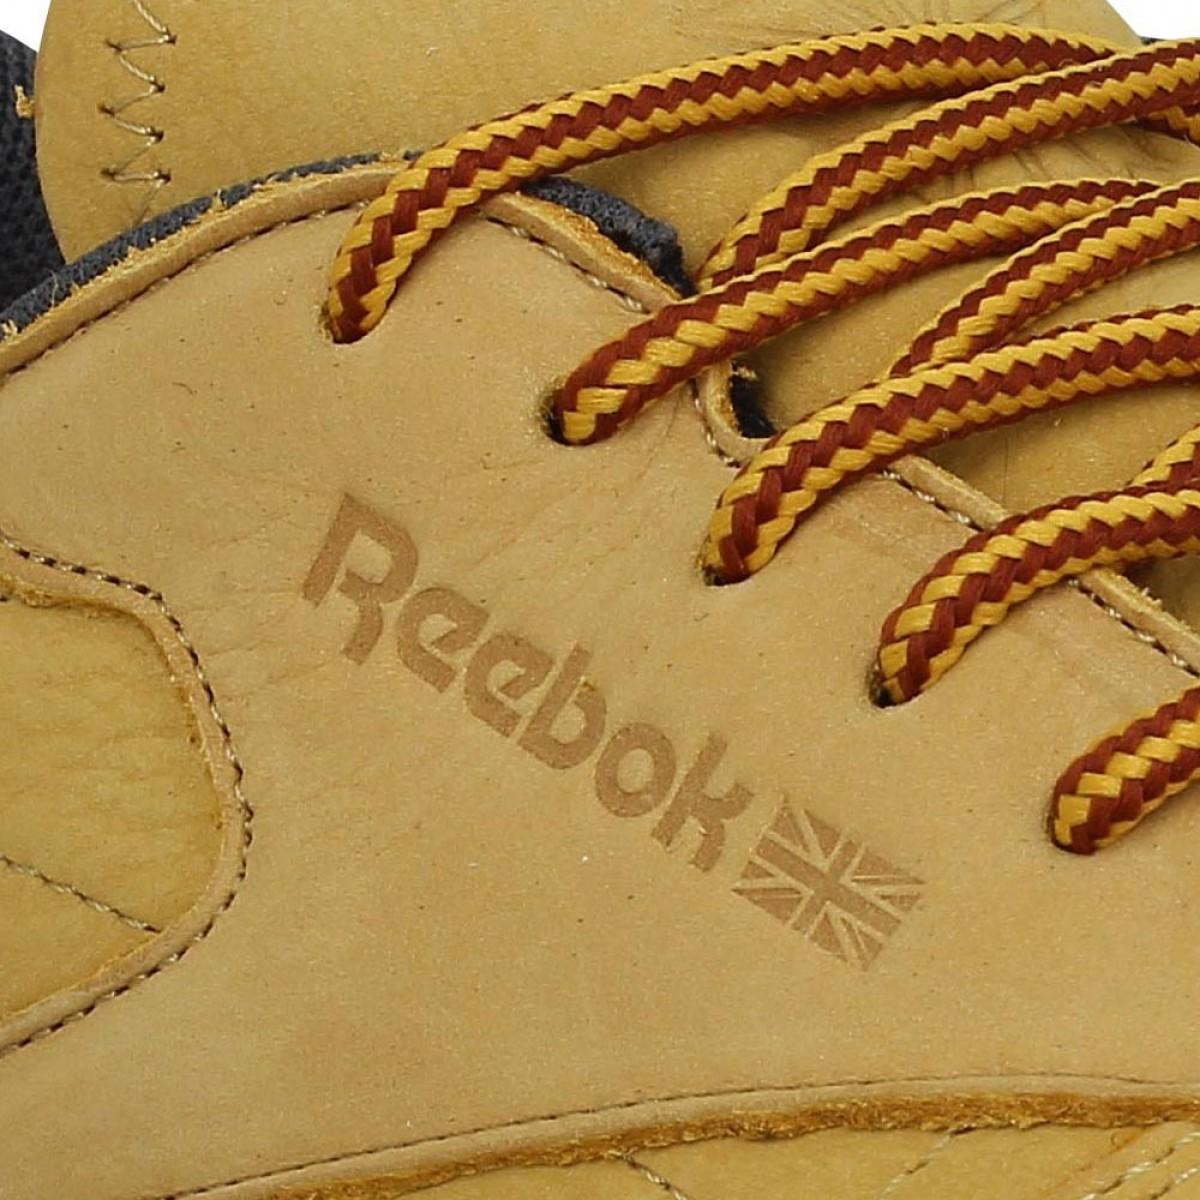 REEBOK Classic Leather Ripple nubuck Homme Gold